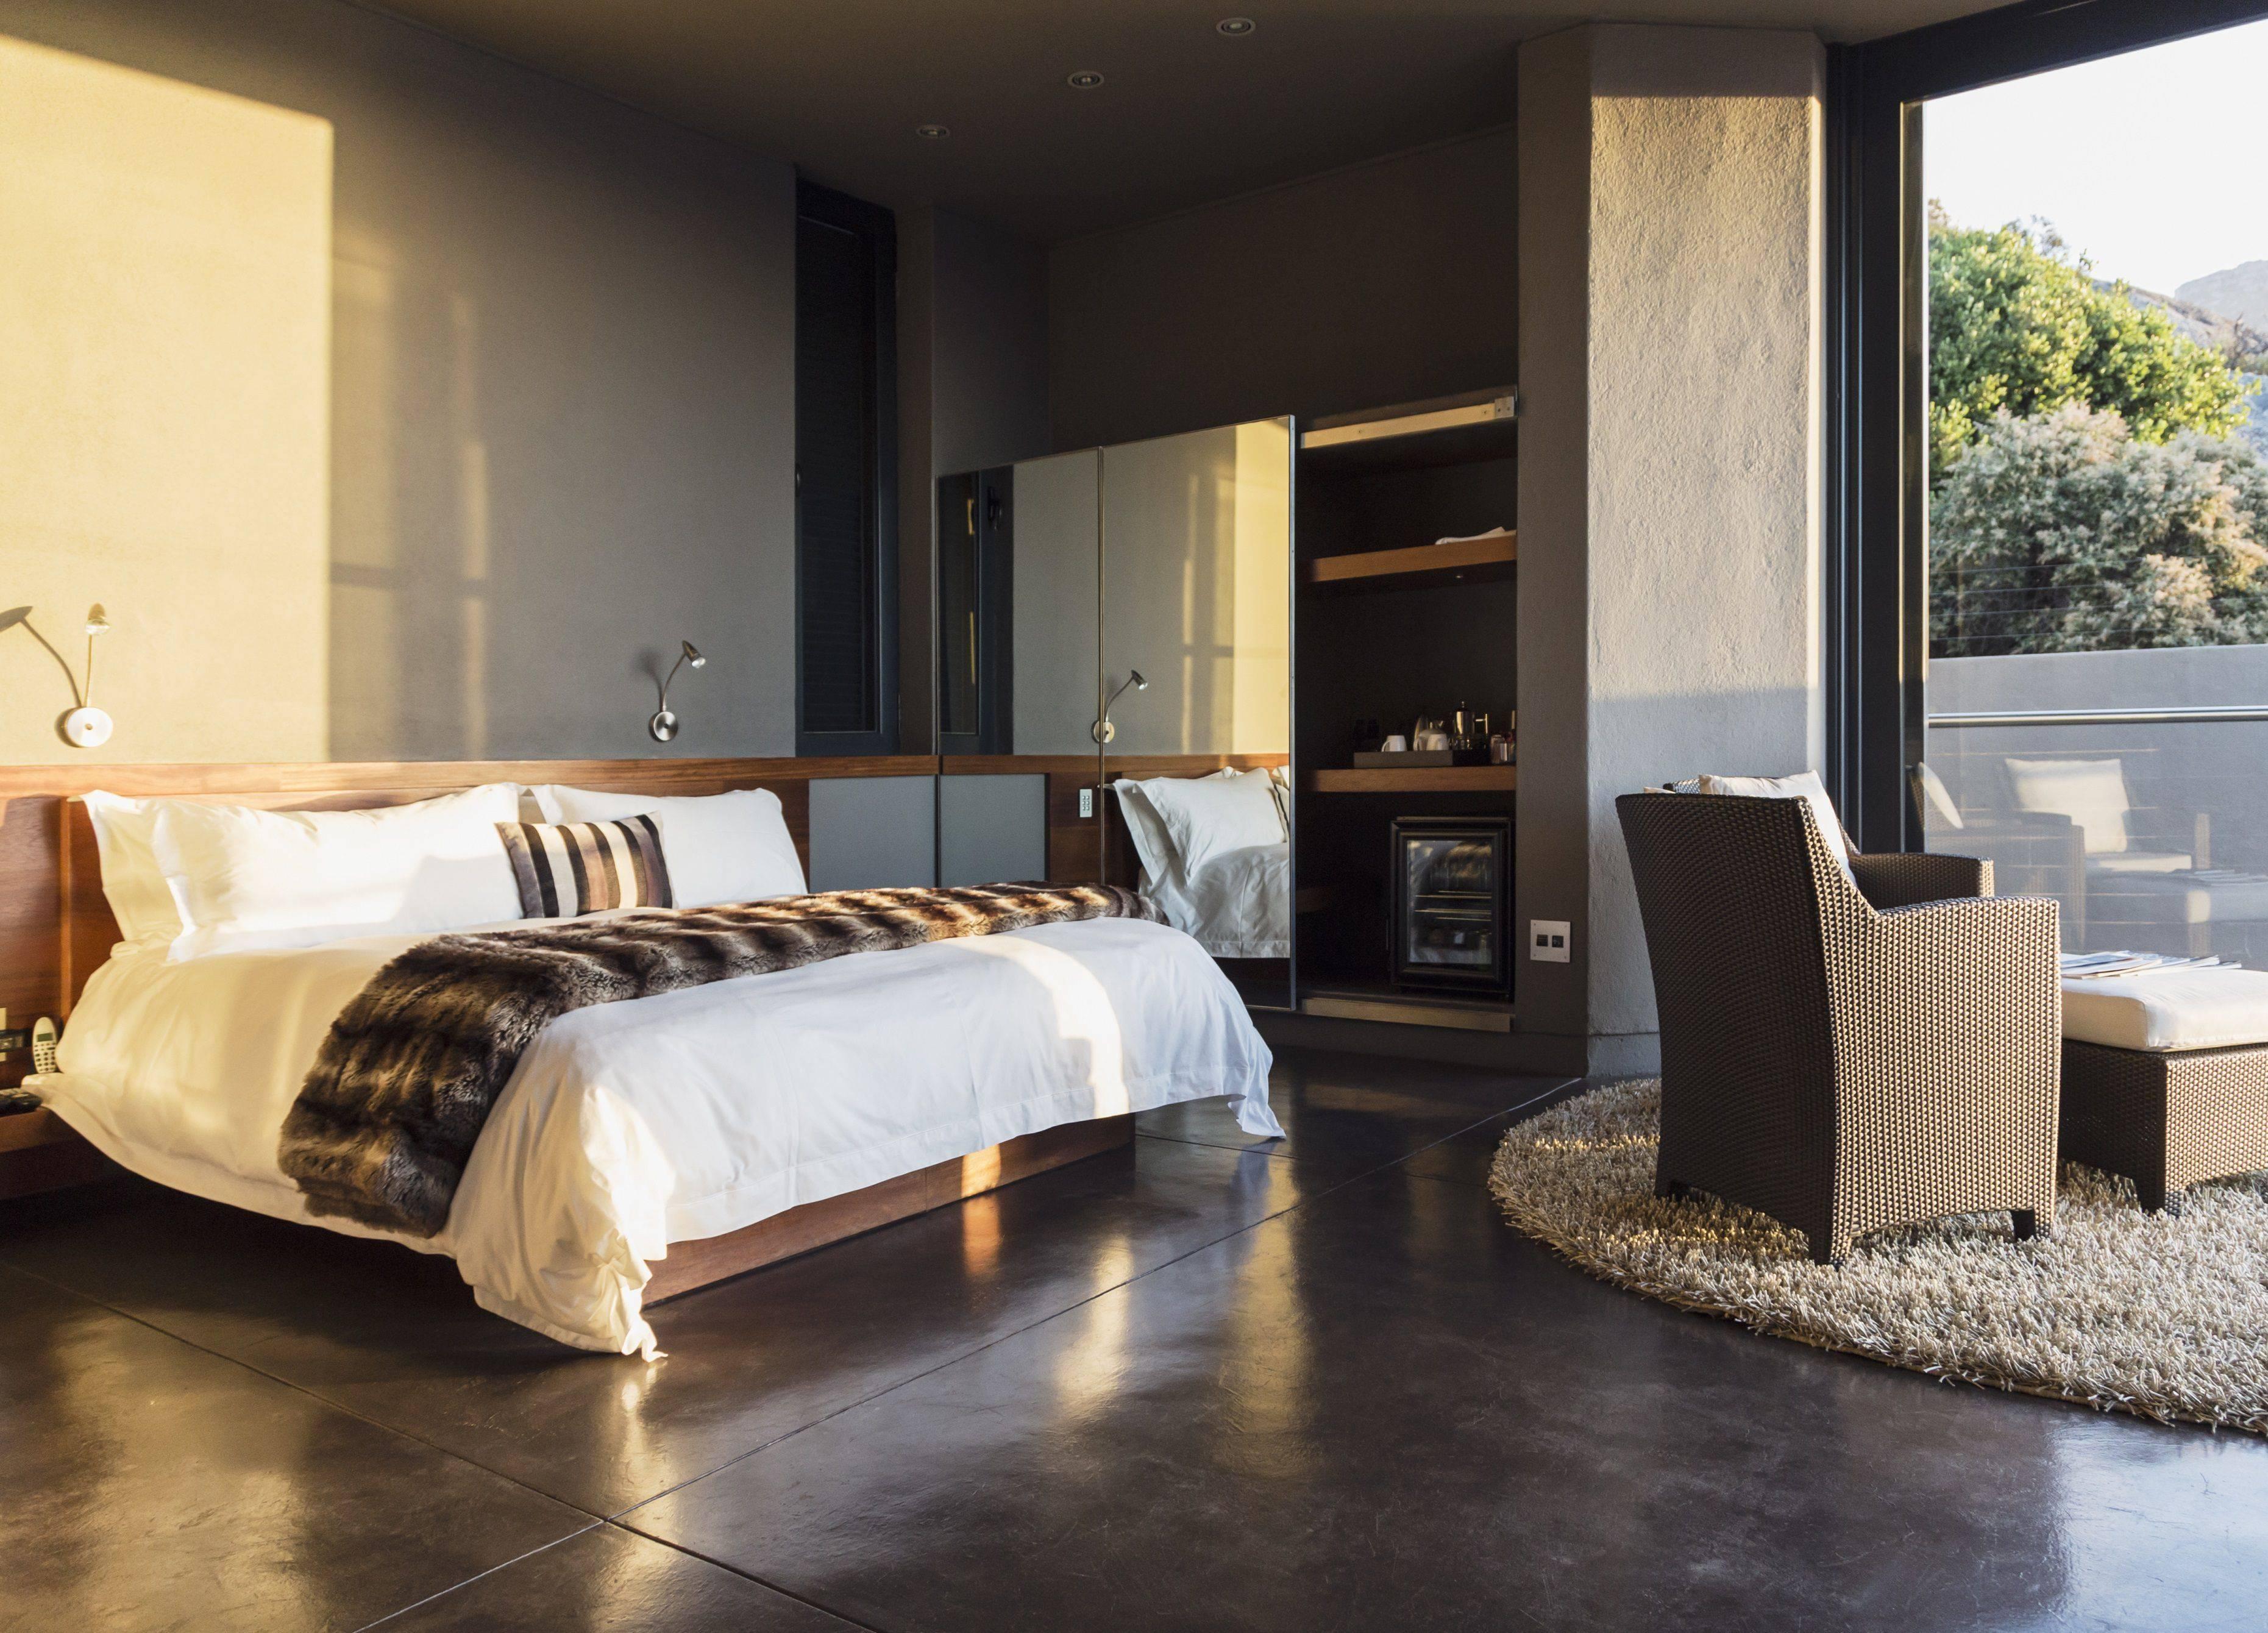 contemporary bedroom 2 56a08e963df78cafdaa2b2d6